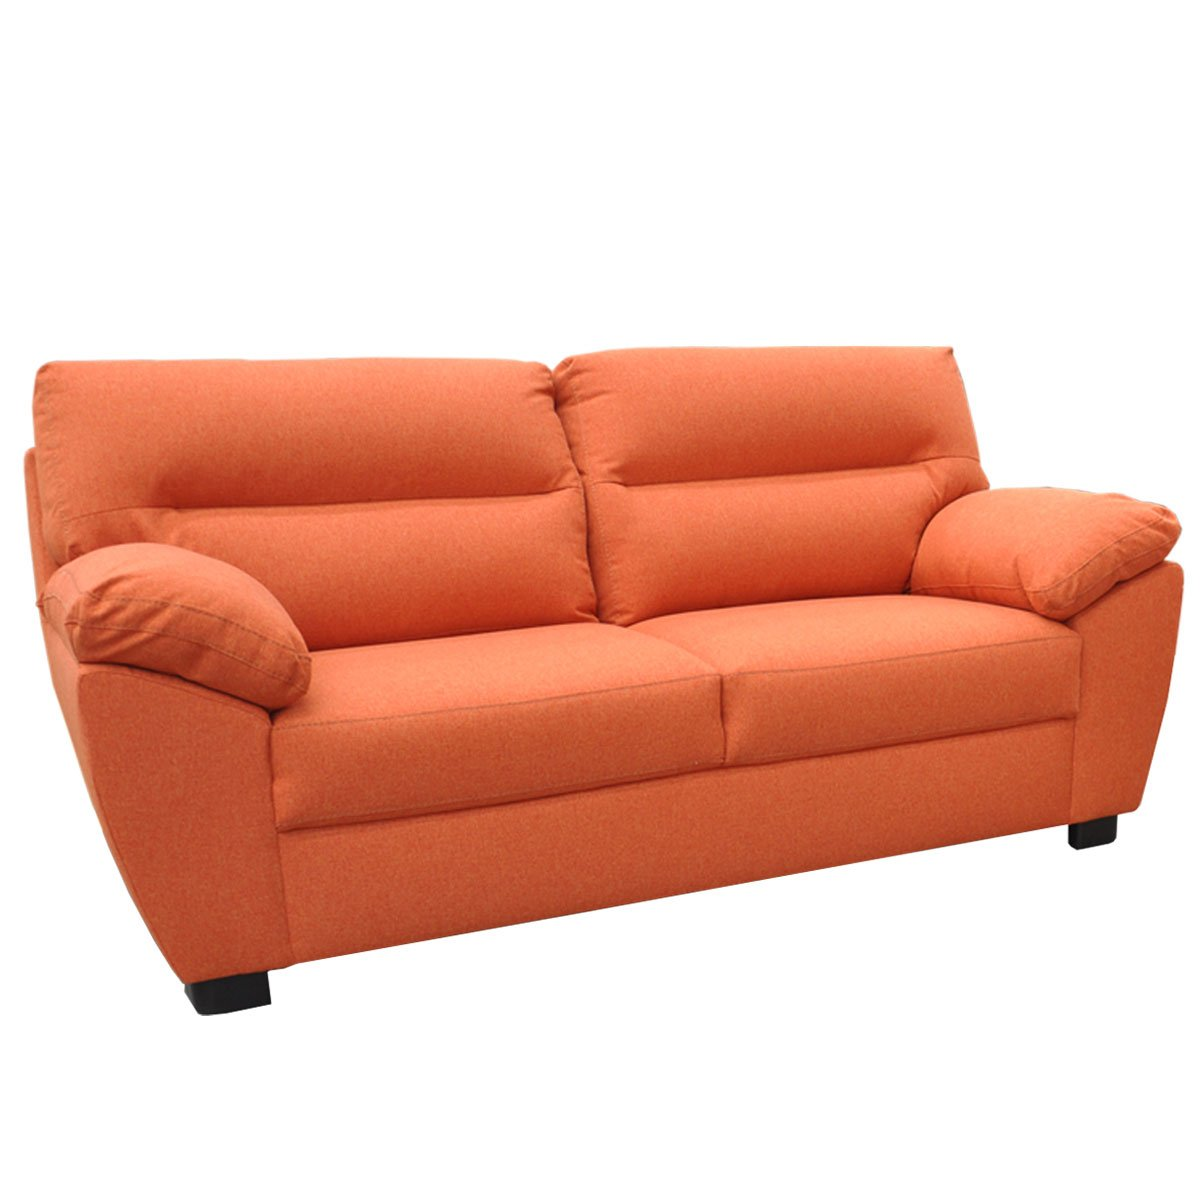 Sof Oxnard Tapiz Tela Naranja Muebles Liz Sears Com Mx Me  # Muebles Liz Sears